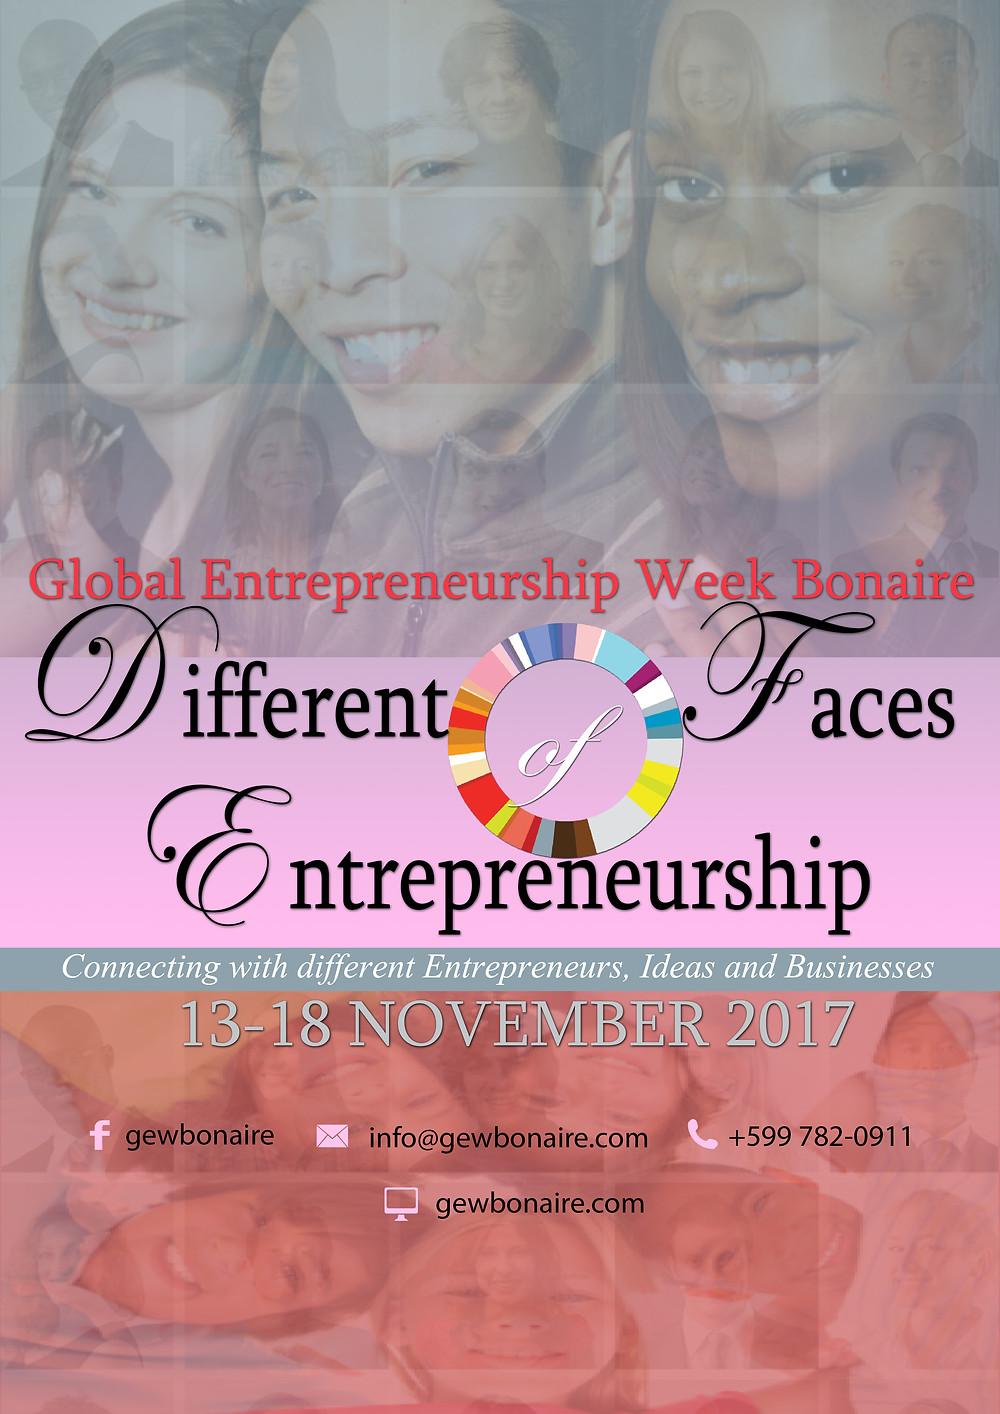 XpBonaire, IslandLife, Bonaire, Information, Events. Global Entrepeneurship